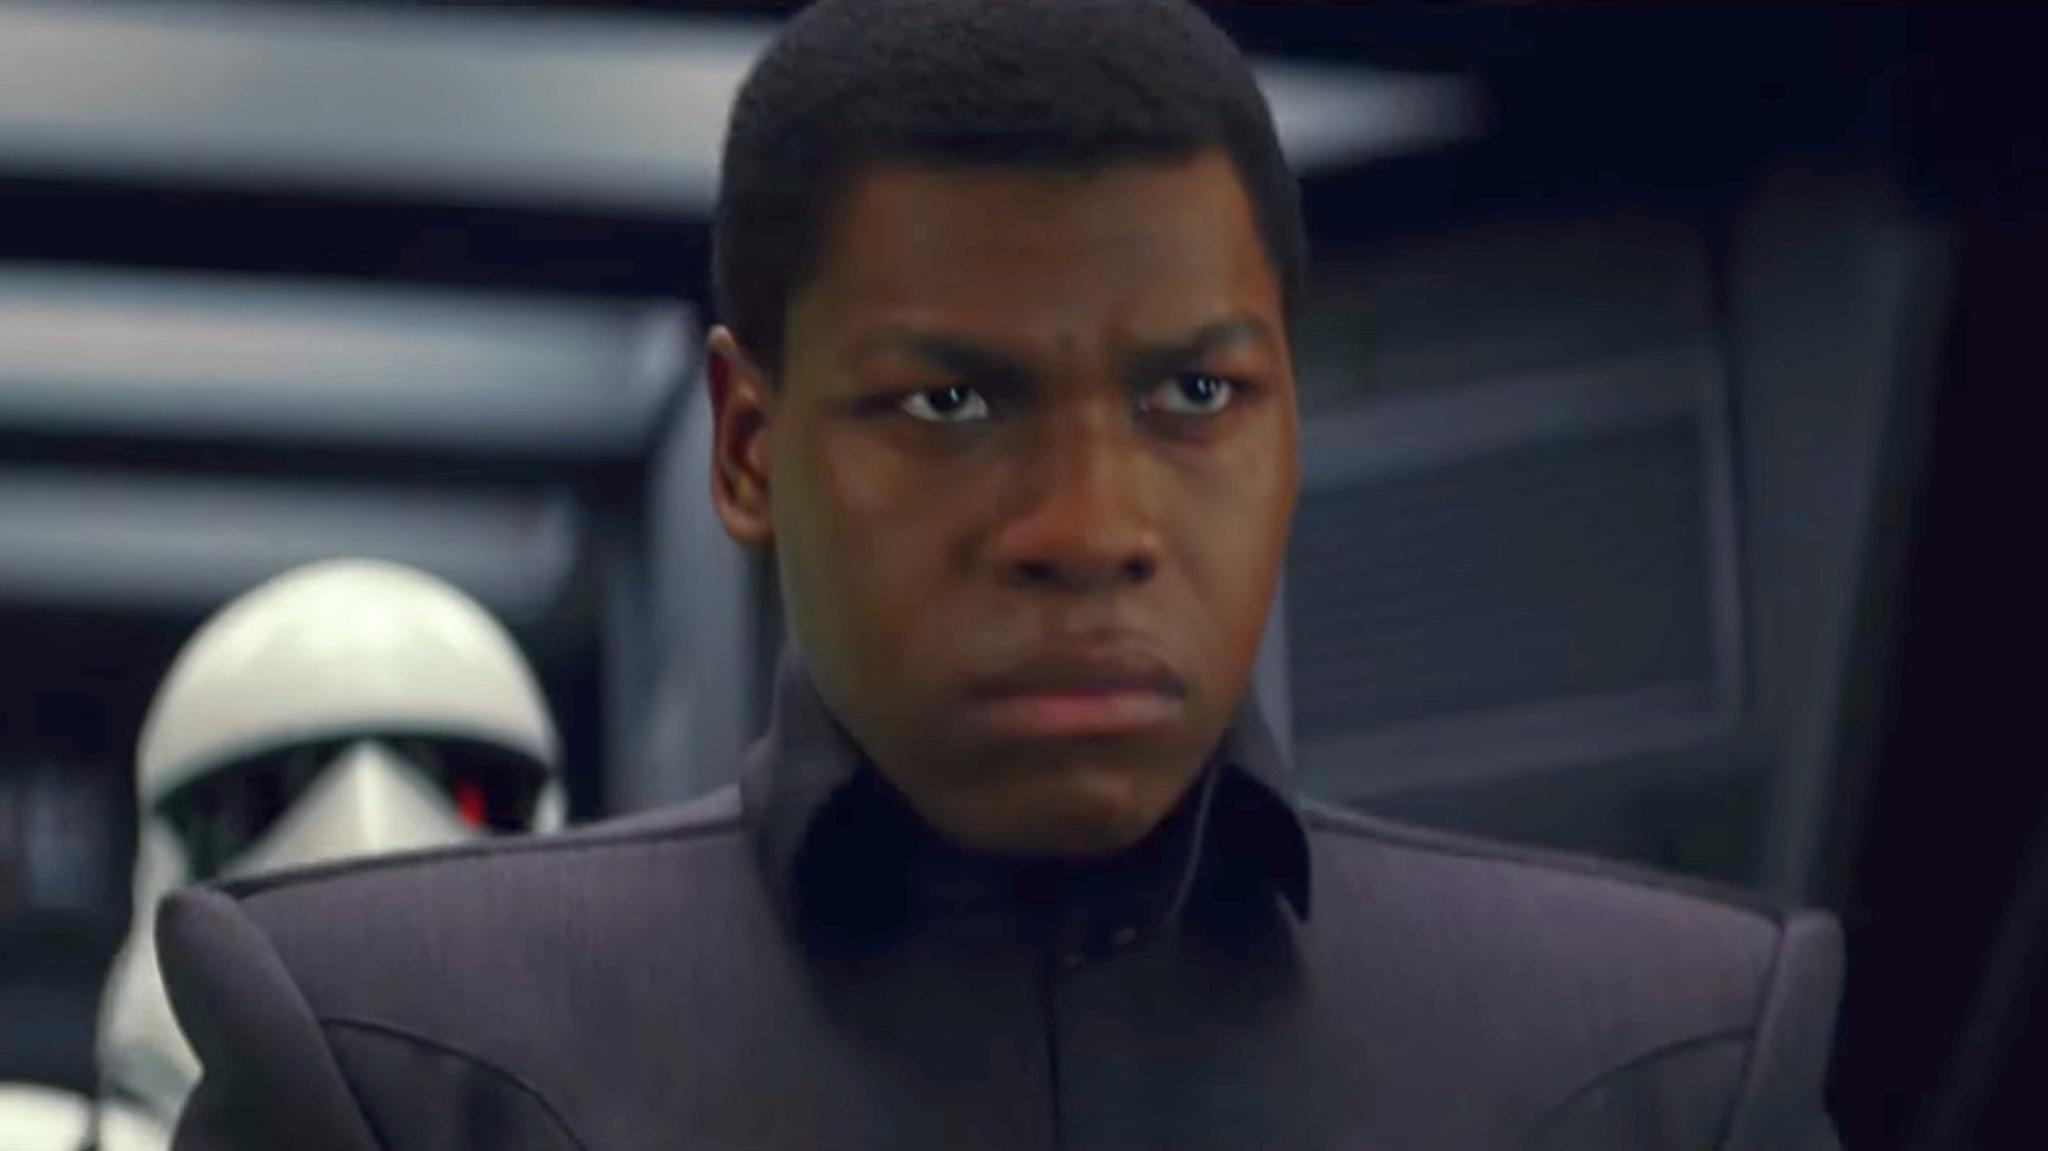 Ergattert John Boyega bald eine Rolle im legendären MCU?